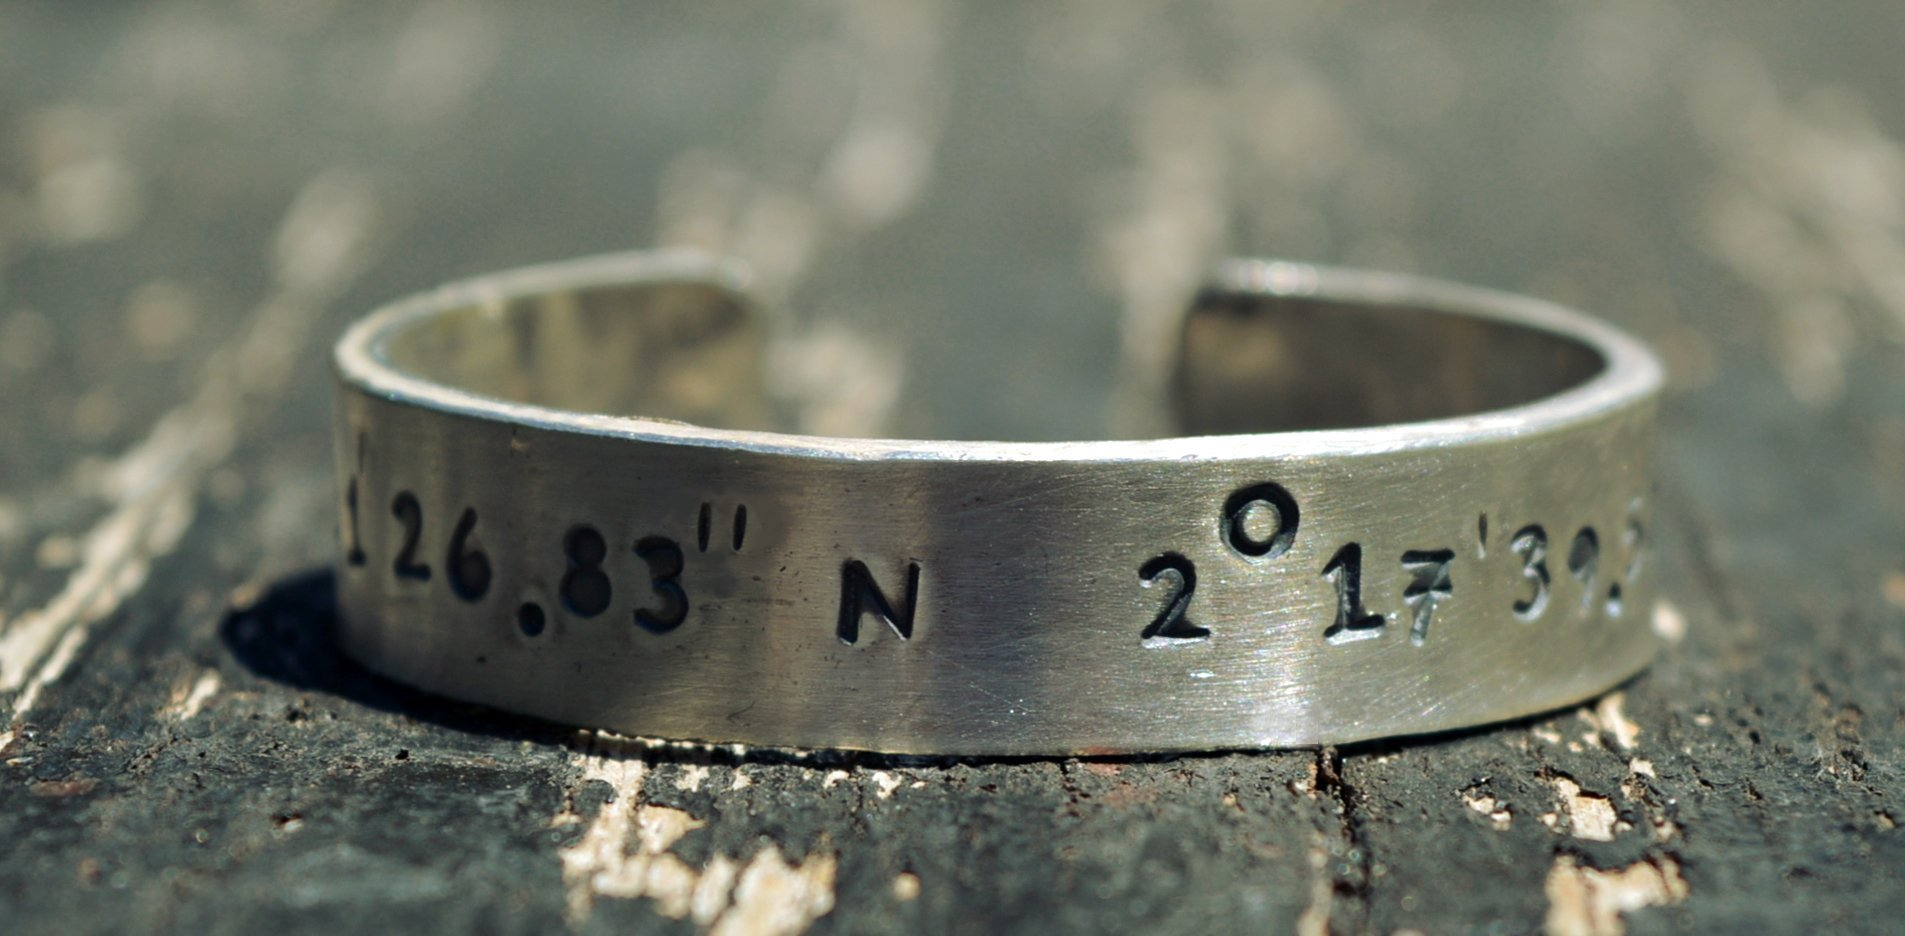 2mm thick custom coordinates bracelet,sterling silver bracelet, latitude, longitude, location bracelet, engraved bracelet, custom bracelet, quote,name,mothers day